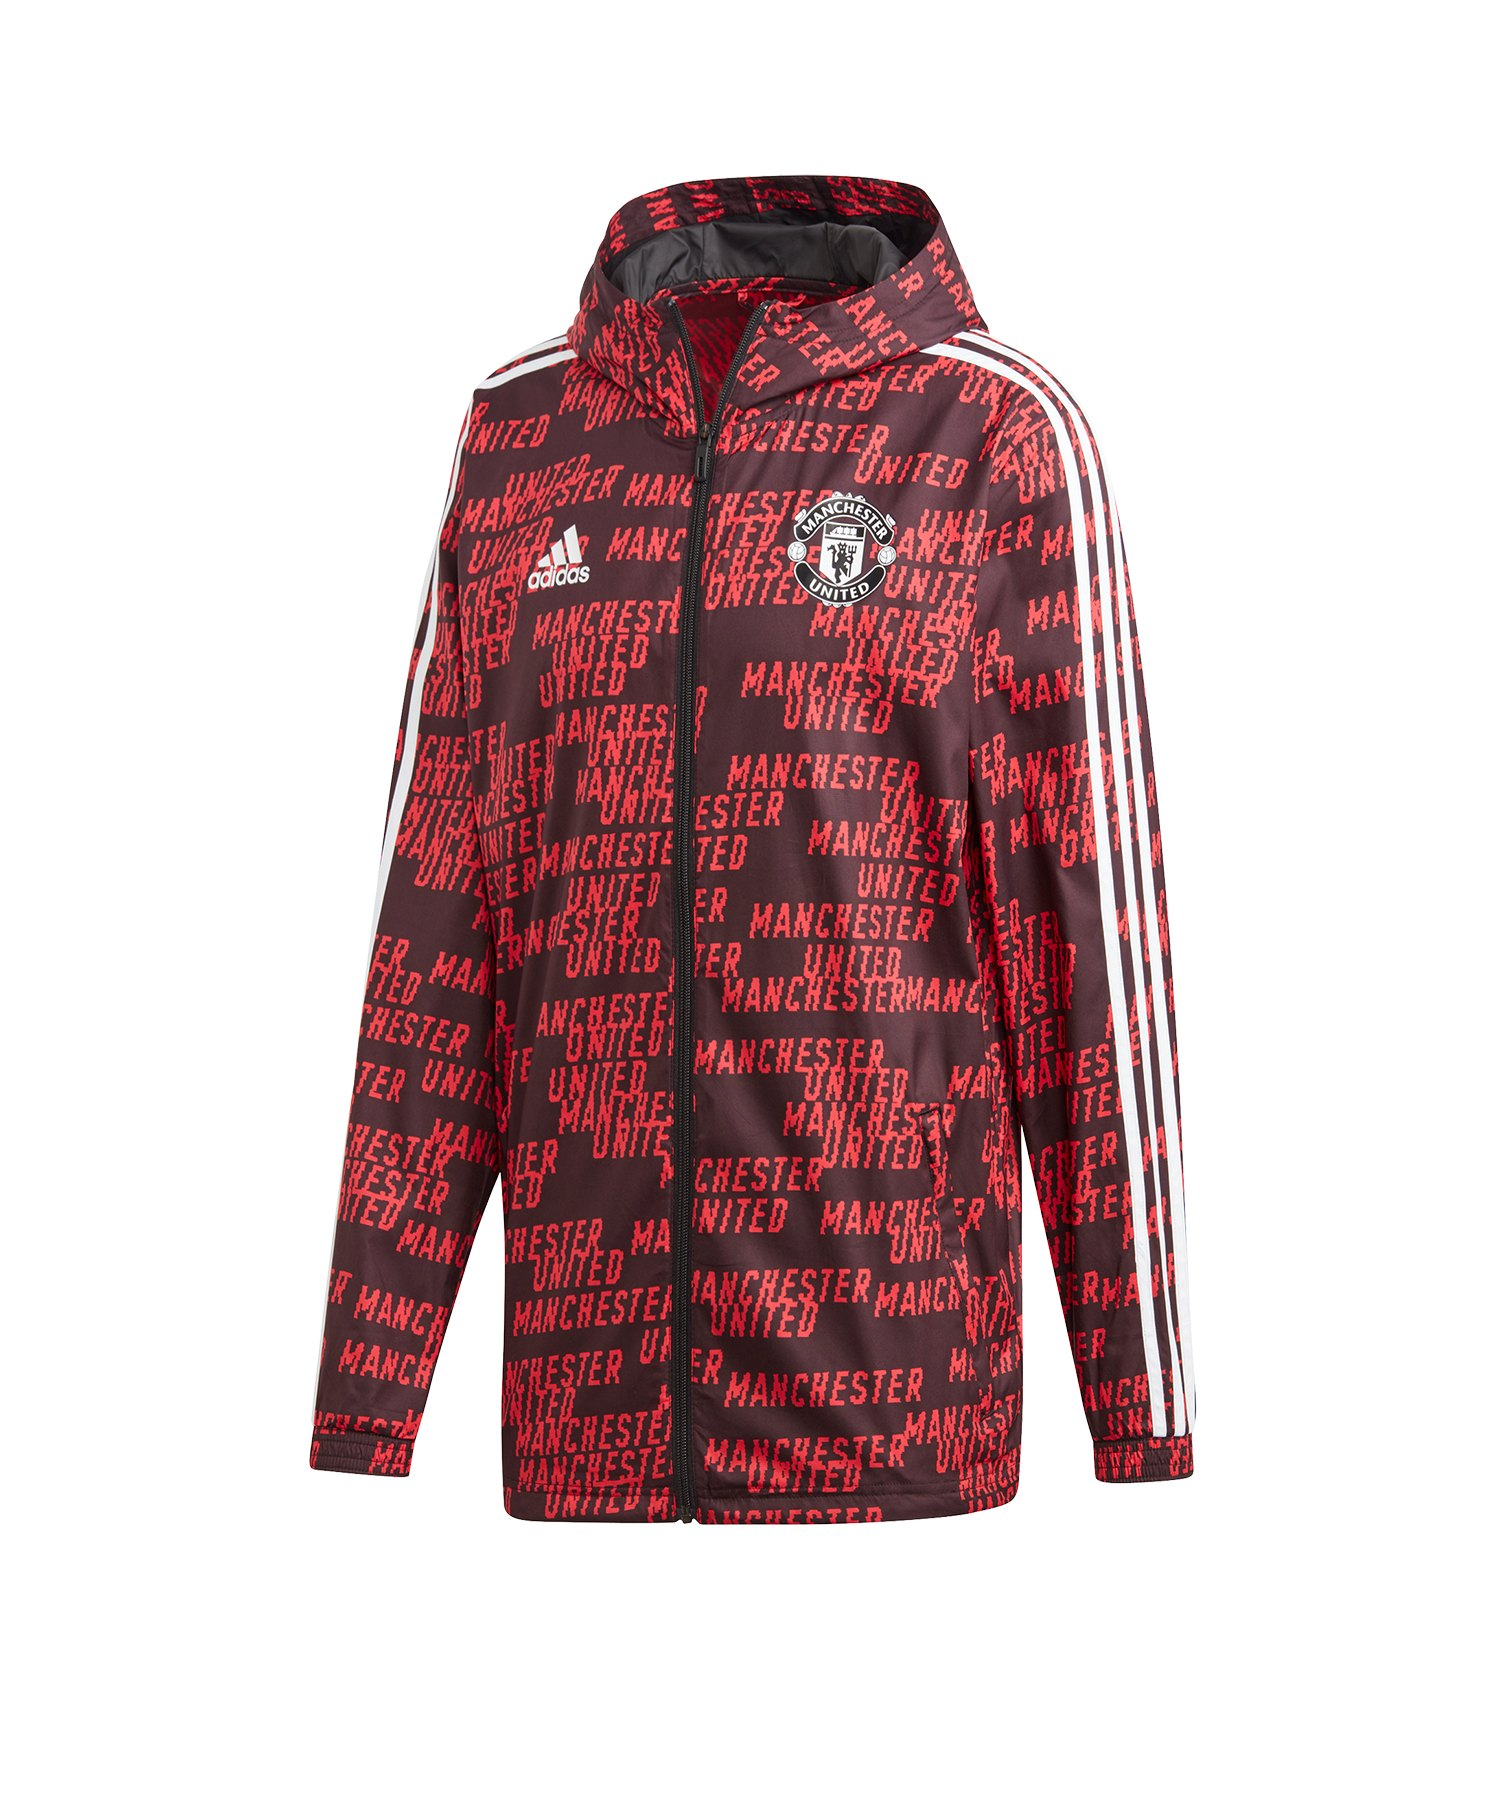 adidas Manchester United Windbreaker Jacke Schwarz - schwarz